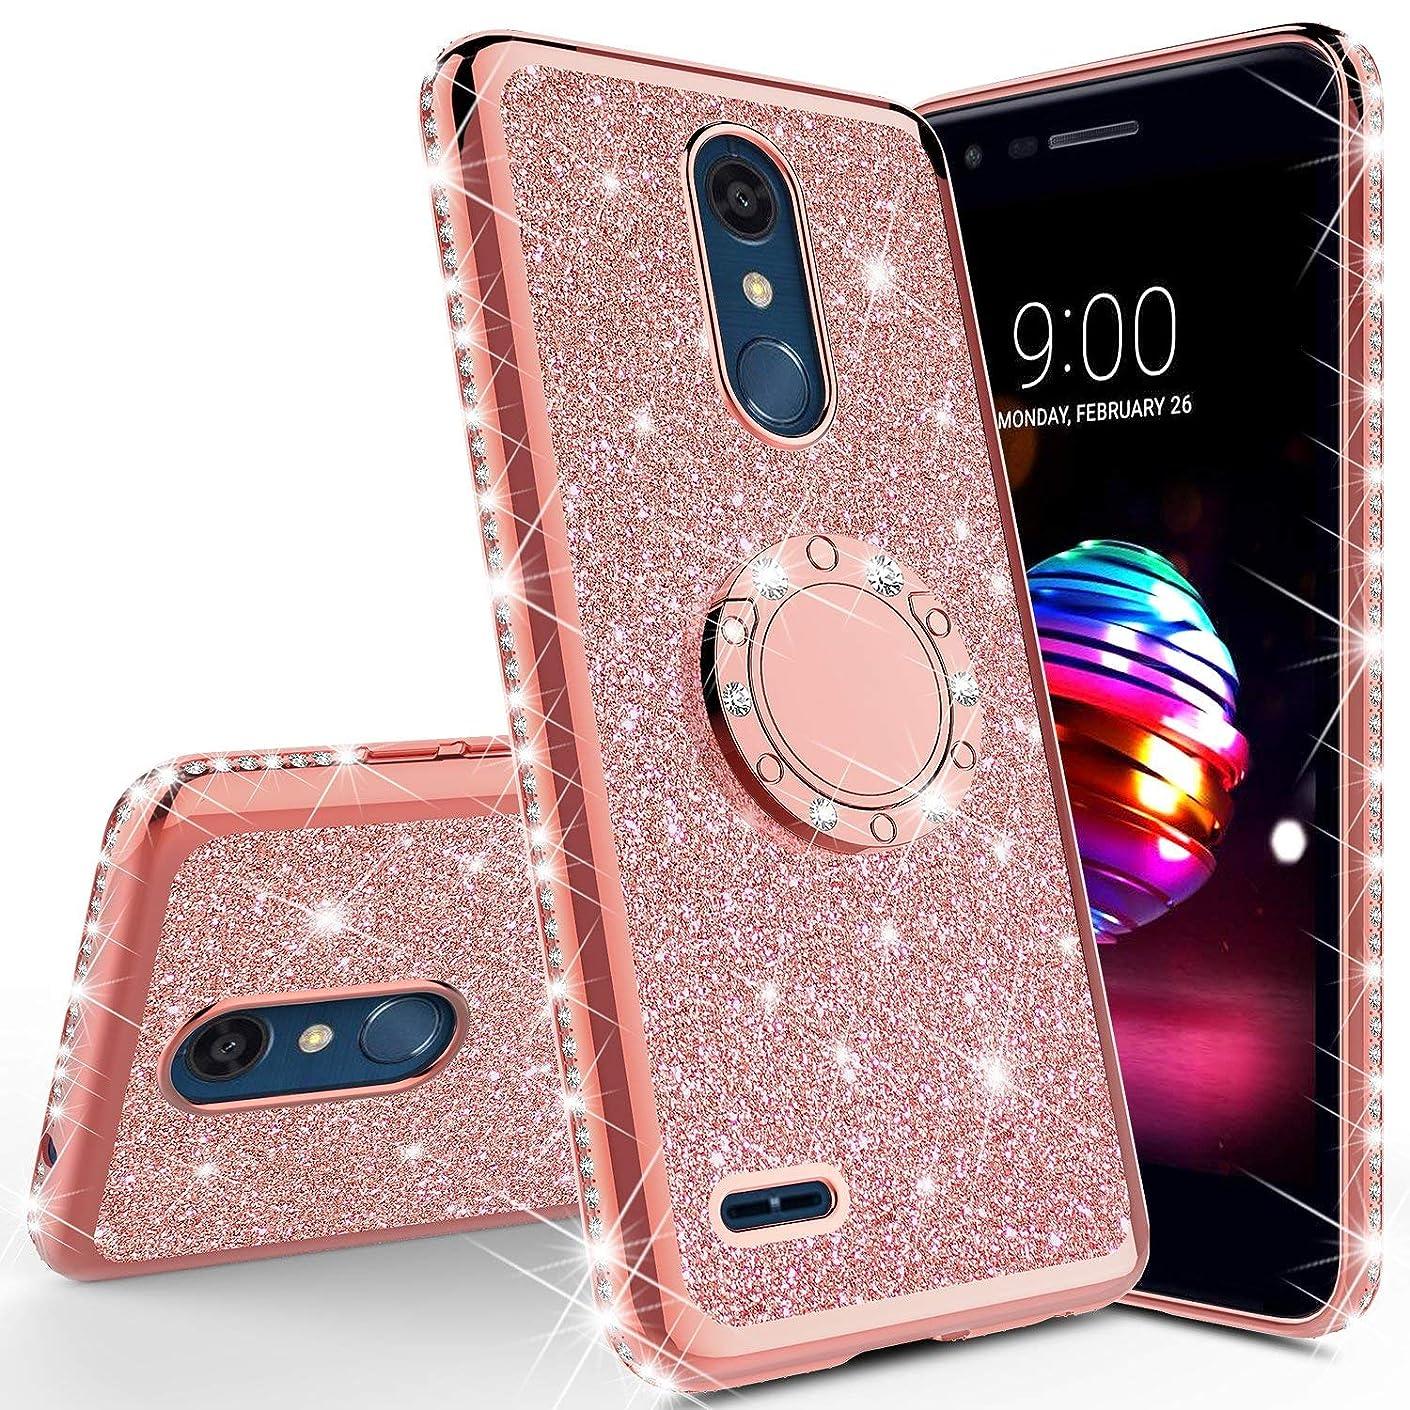 LG K10 2018/ K30 /Premier Pro LTE/Harmony 2/ Phoenix Plus/Xpression Plus Cute Glitter Bling Sparkle Diamond Studded Soft Flexible TPU Shockproof Women Ring Stand Bumper Cover + Lanyard (Rose Gold)